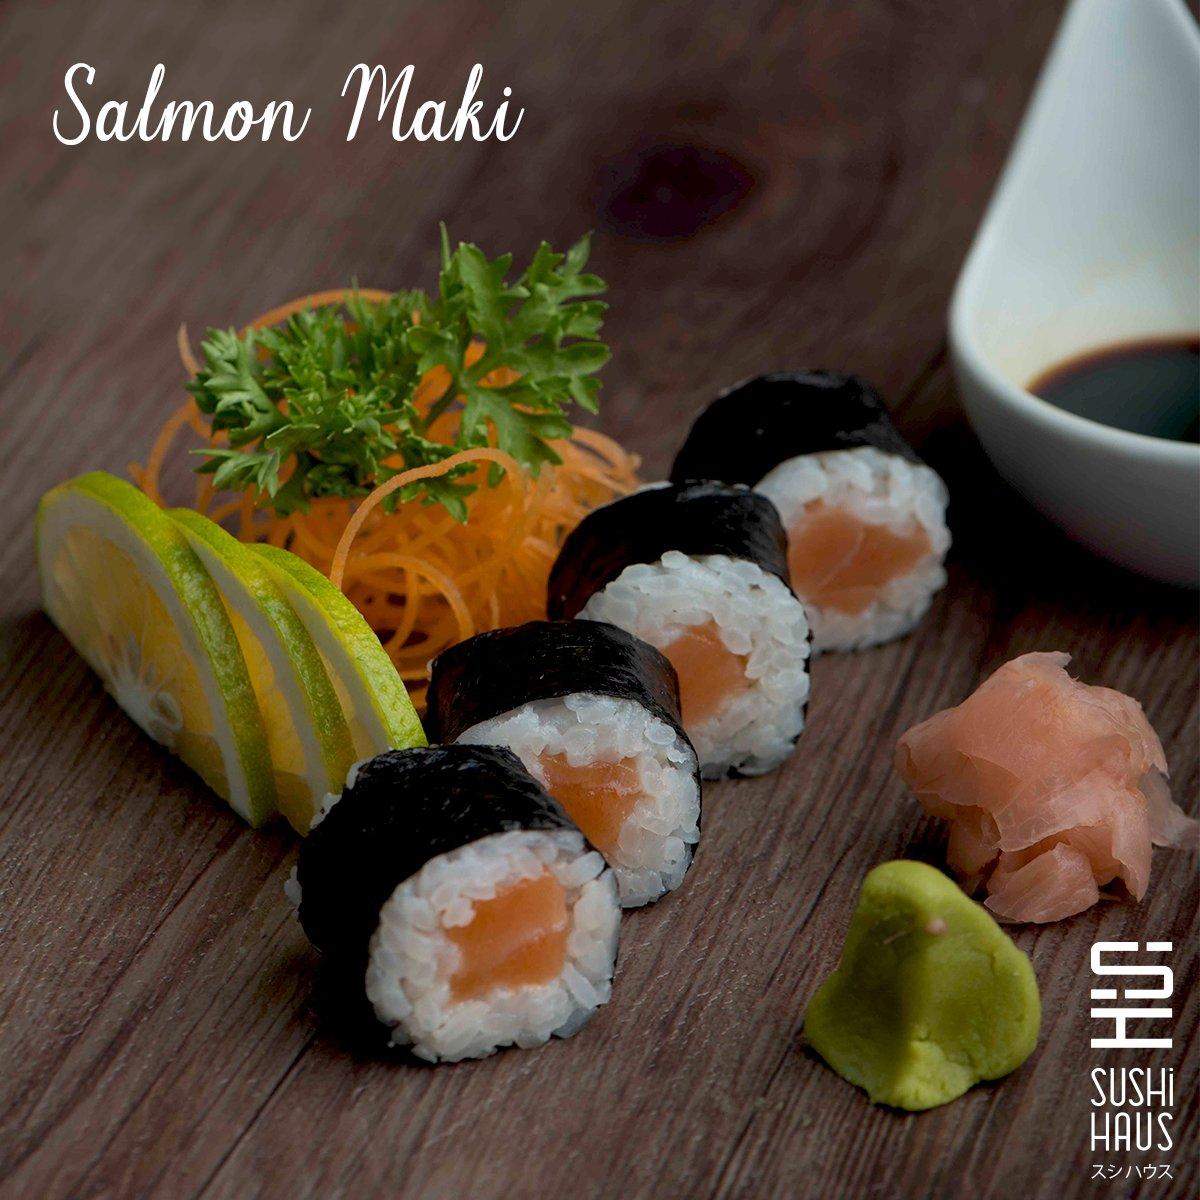 Sushihaus Hashtag On Twitter